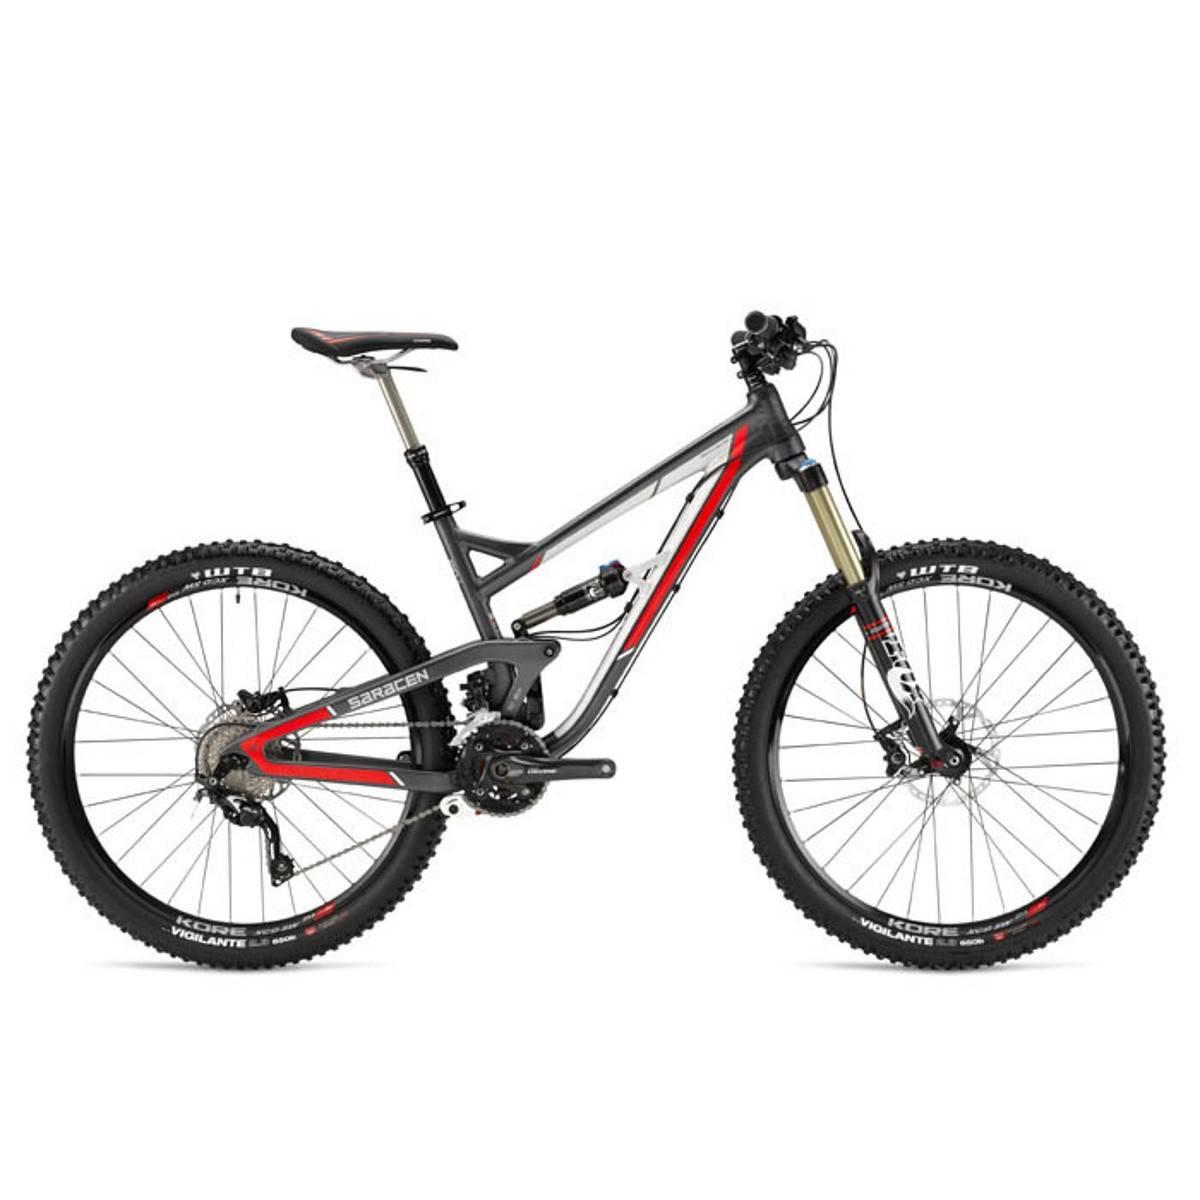 Saracen Ariel 151 Mountain Bike 2015 - Full Suspension MTB $2,450.00